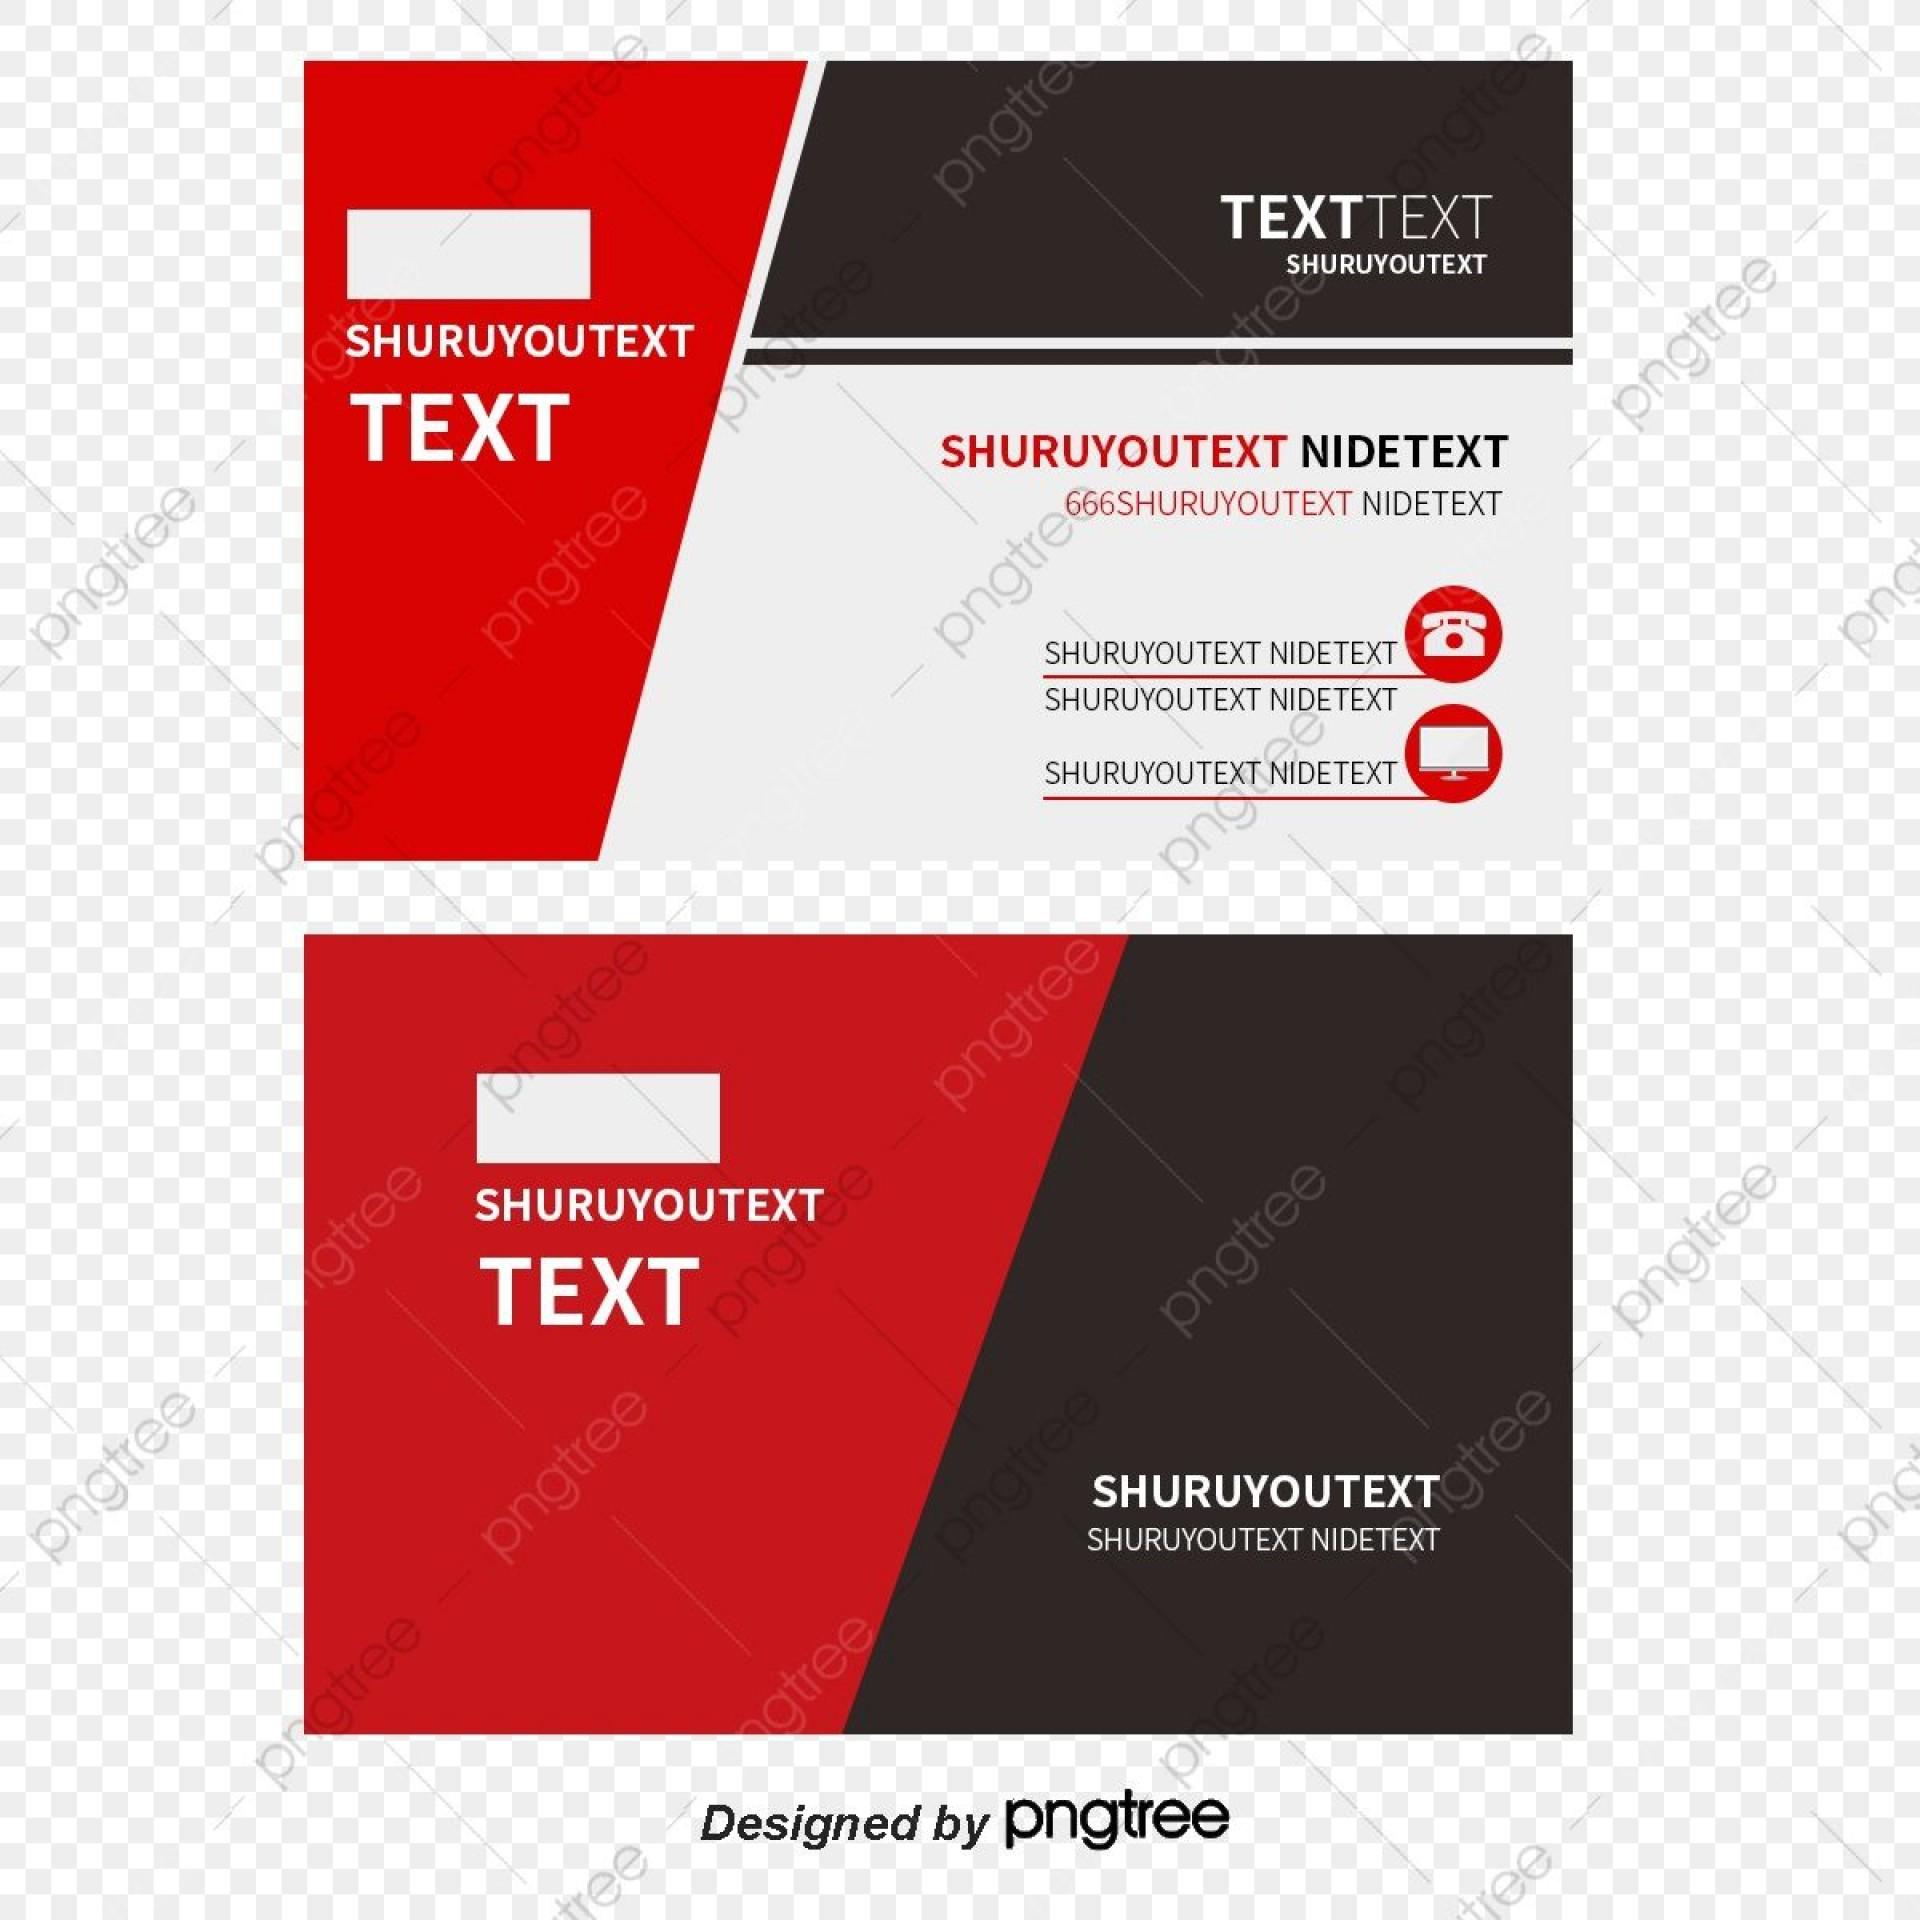 003 Stupendou Simple Visiting Card Design Psd Idea  Minimalist Busines Template Free File Download In Photoshop1920